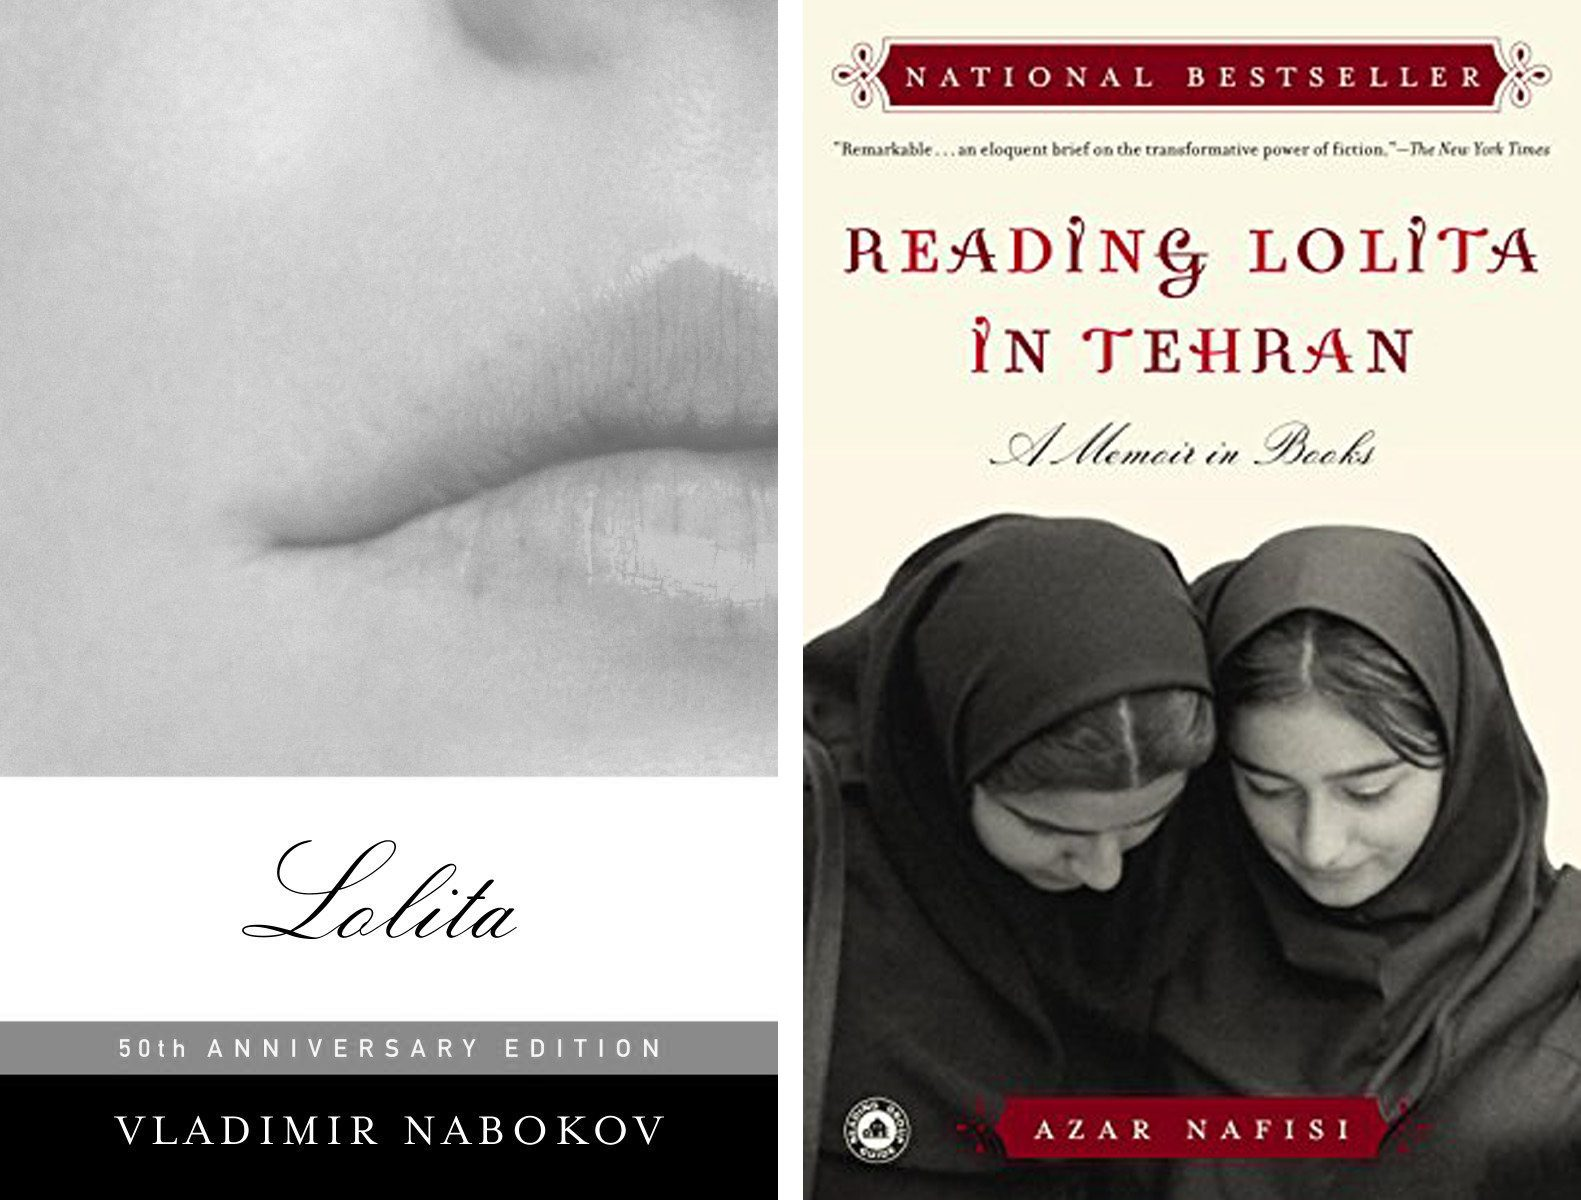 lolita and reading lolita in tehran